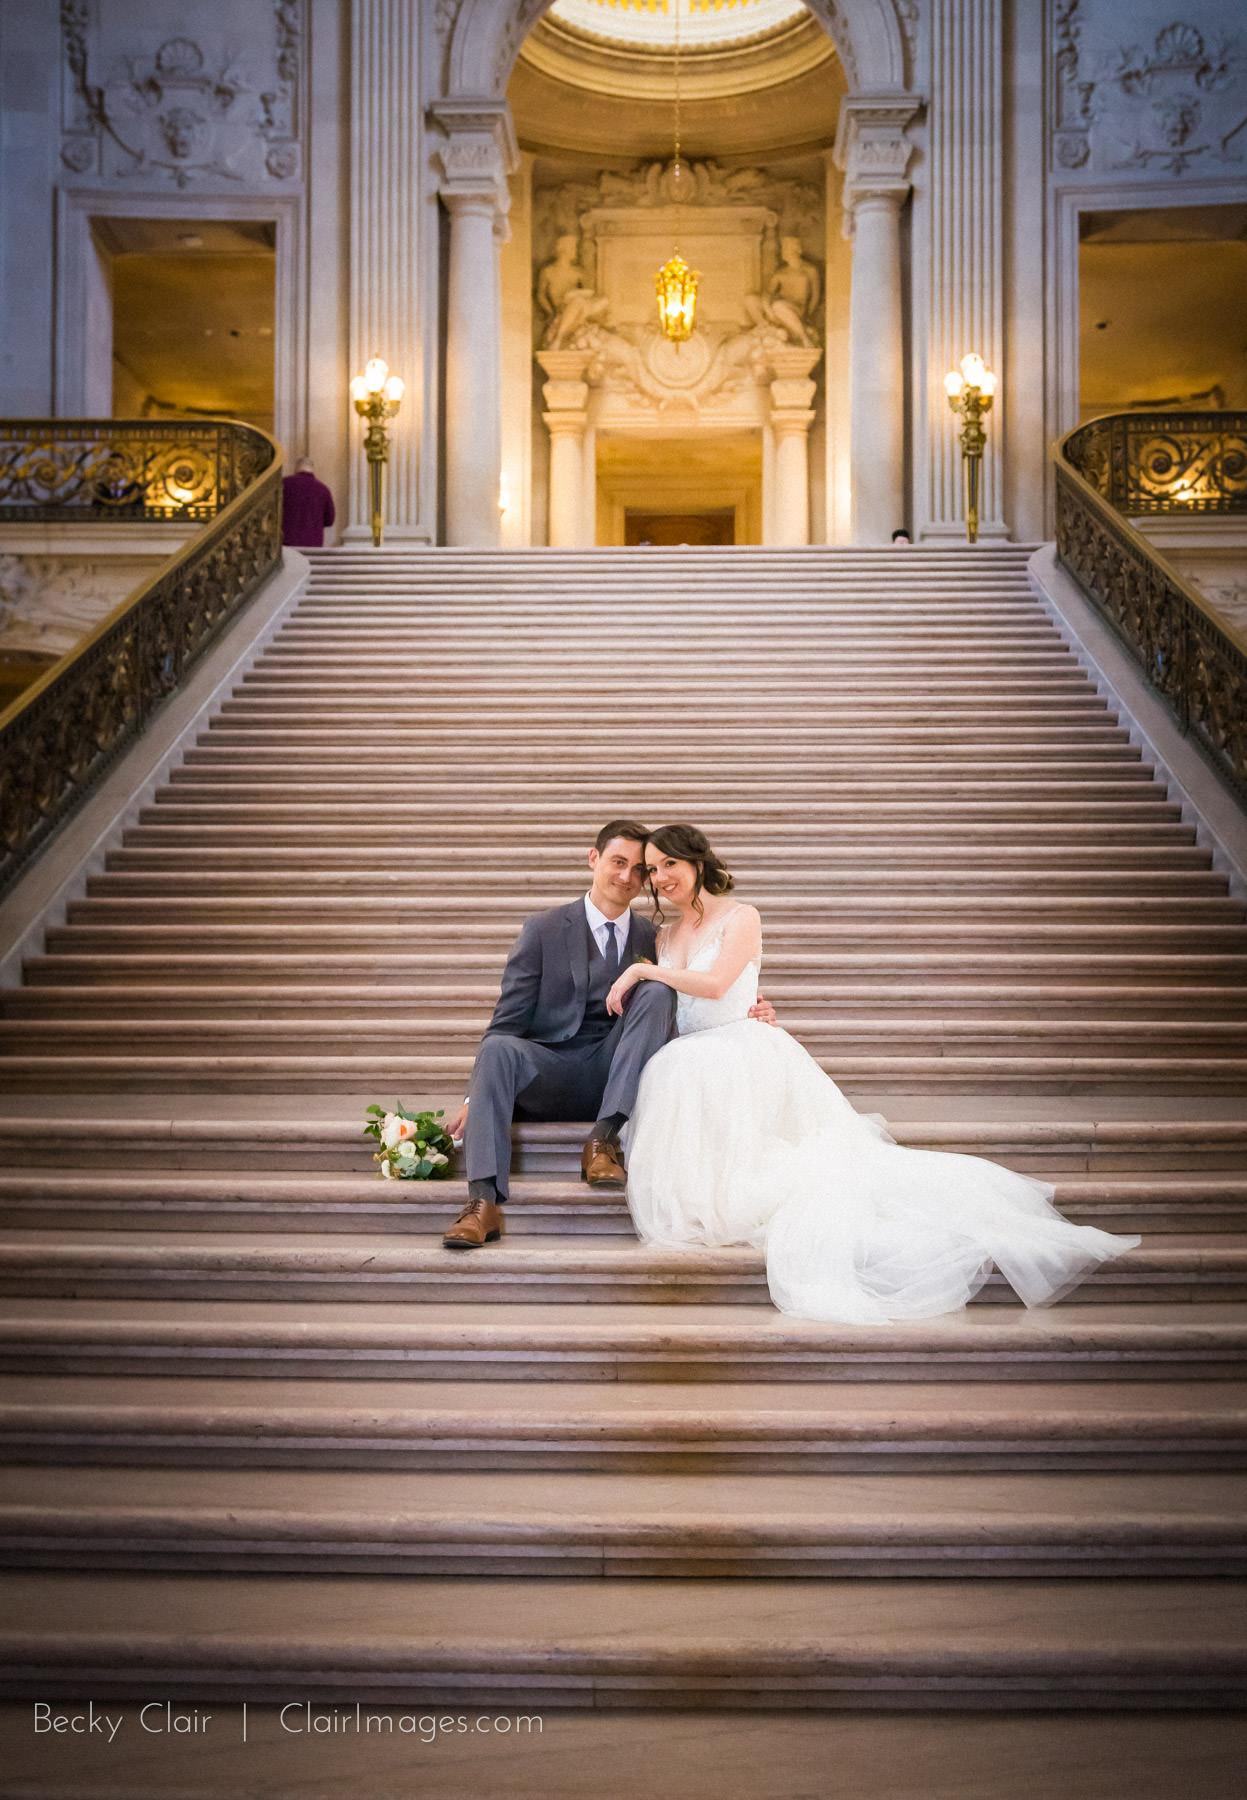 San Francisco Weddings - San Francisco City Hall © Clair Images 2017